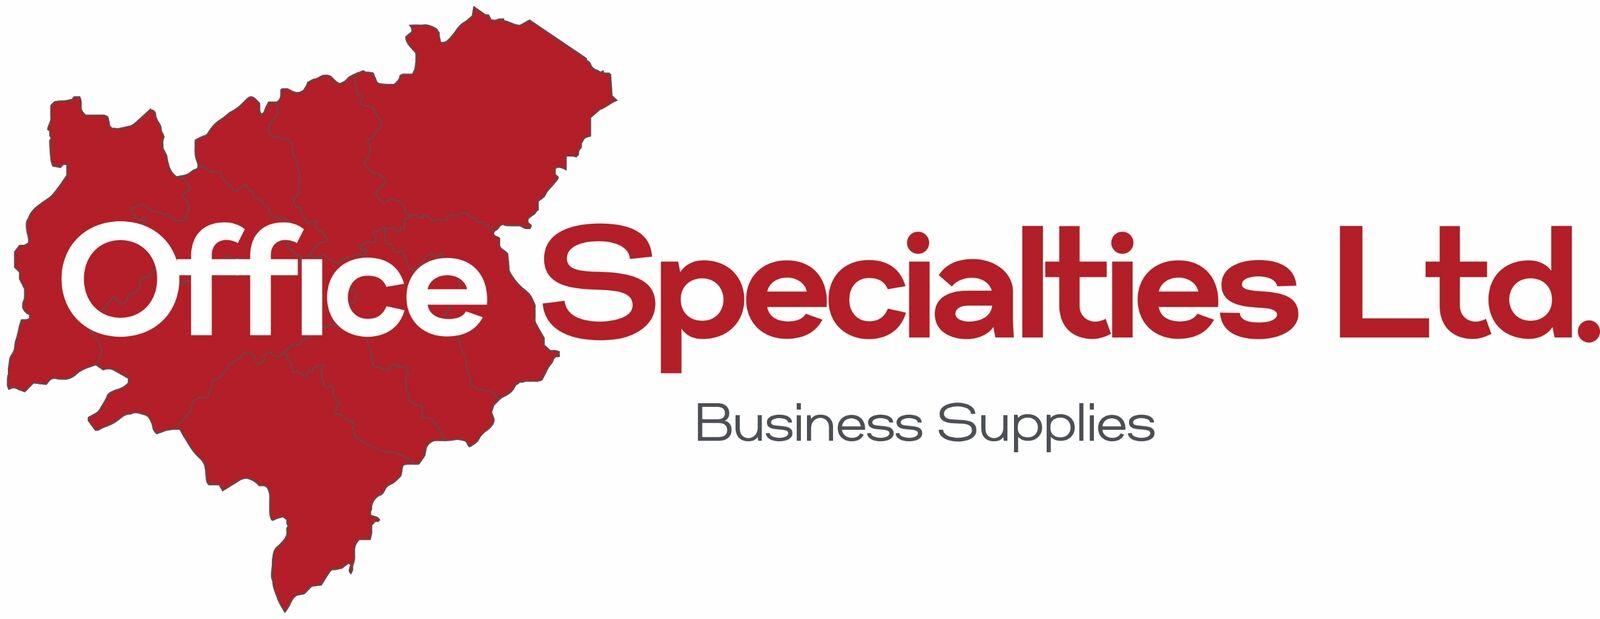 Office Specialties Ltd